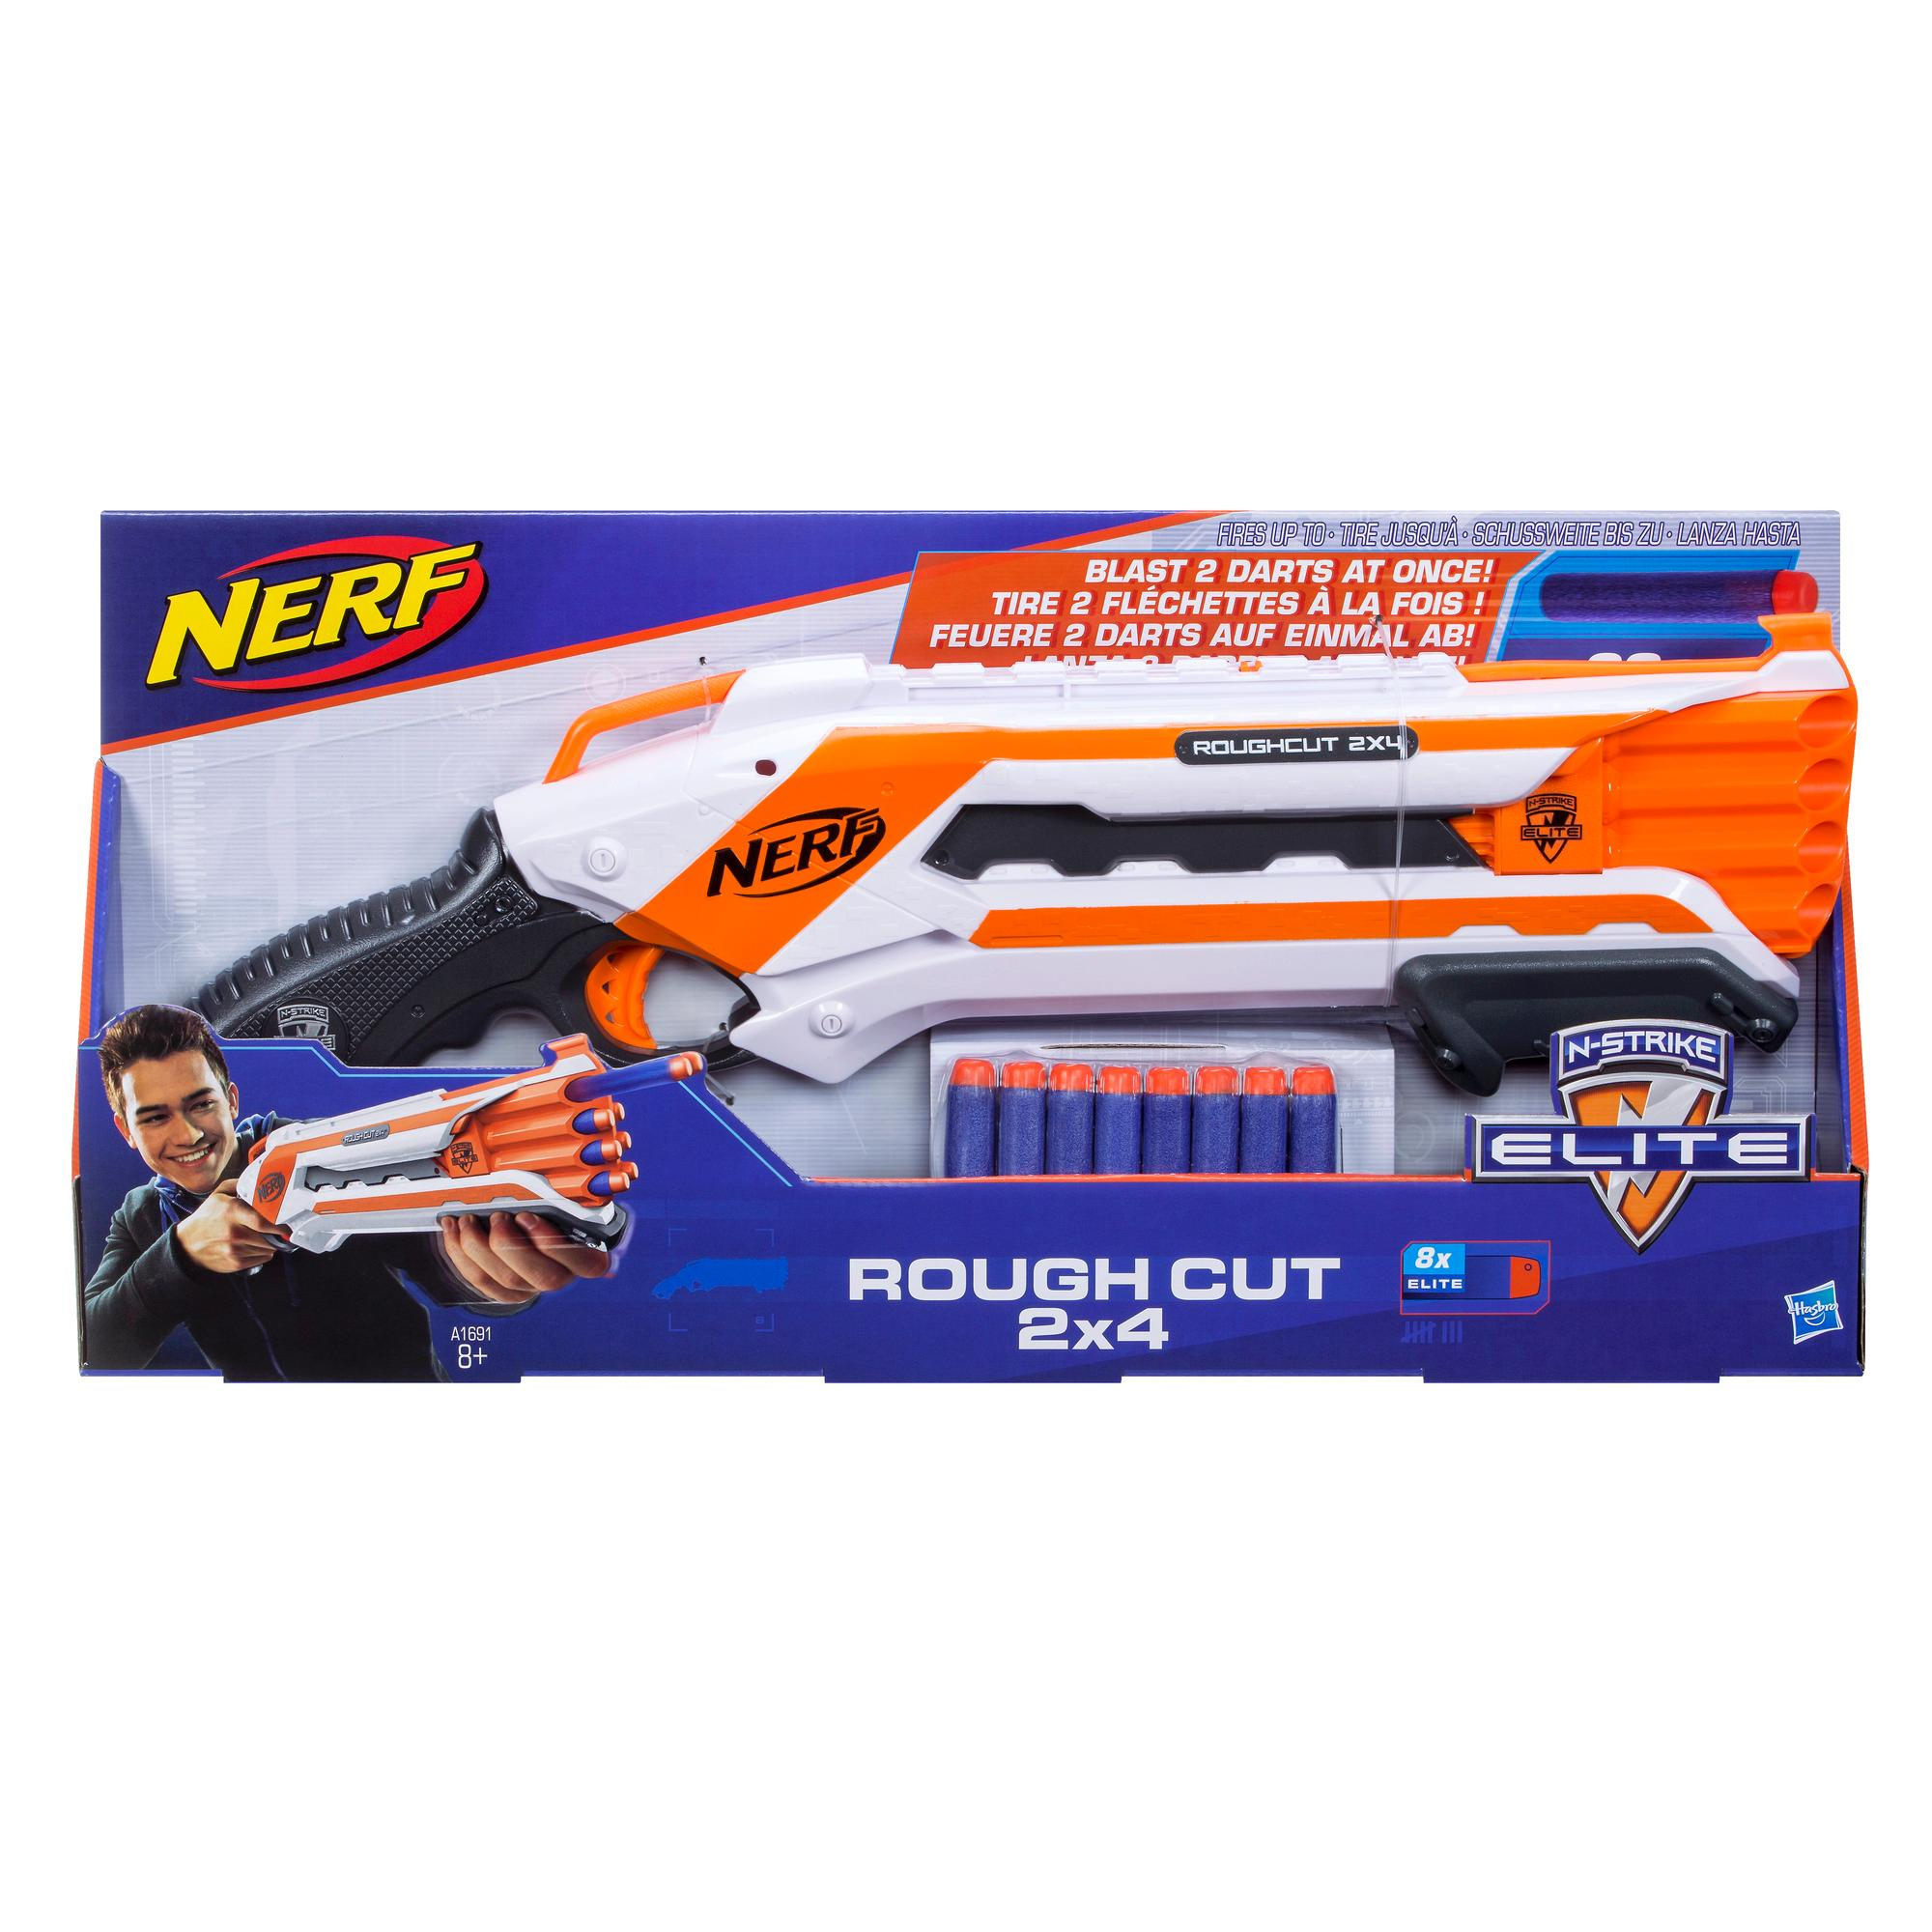 Blaster NERF N-Strike Elite Rough Cut 2x4